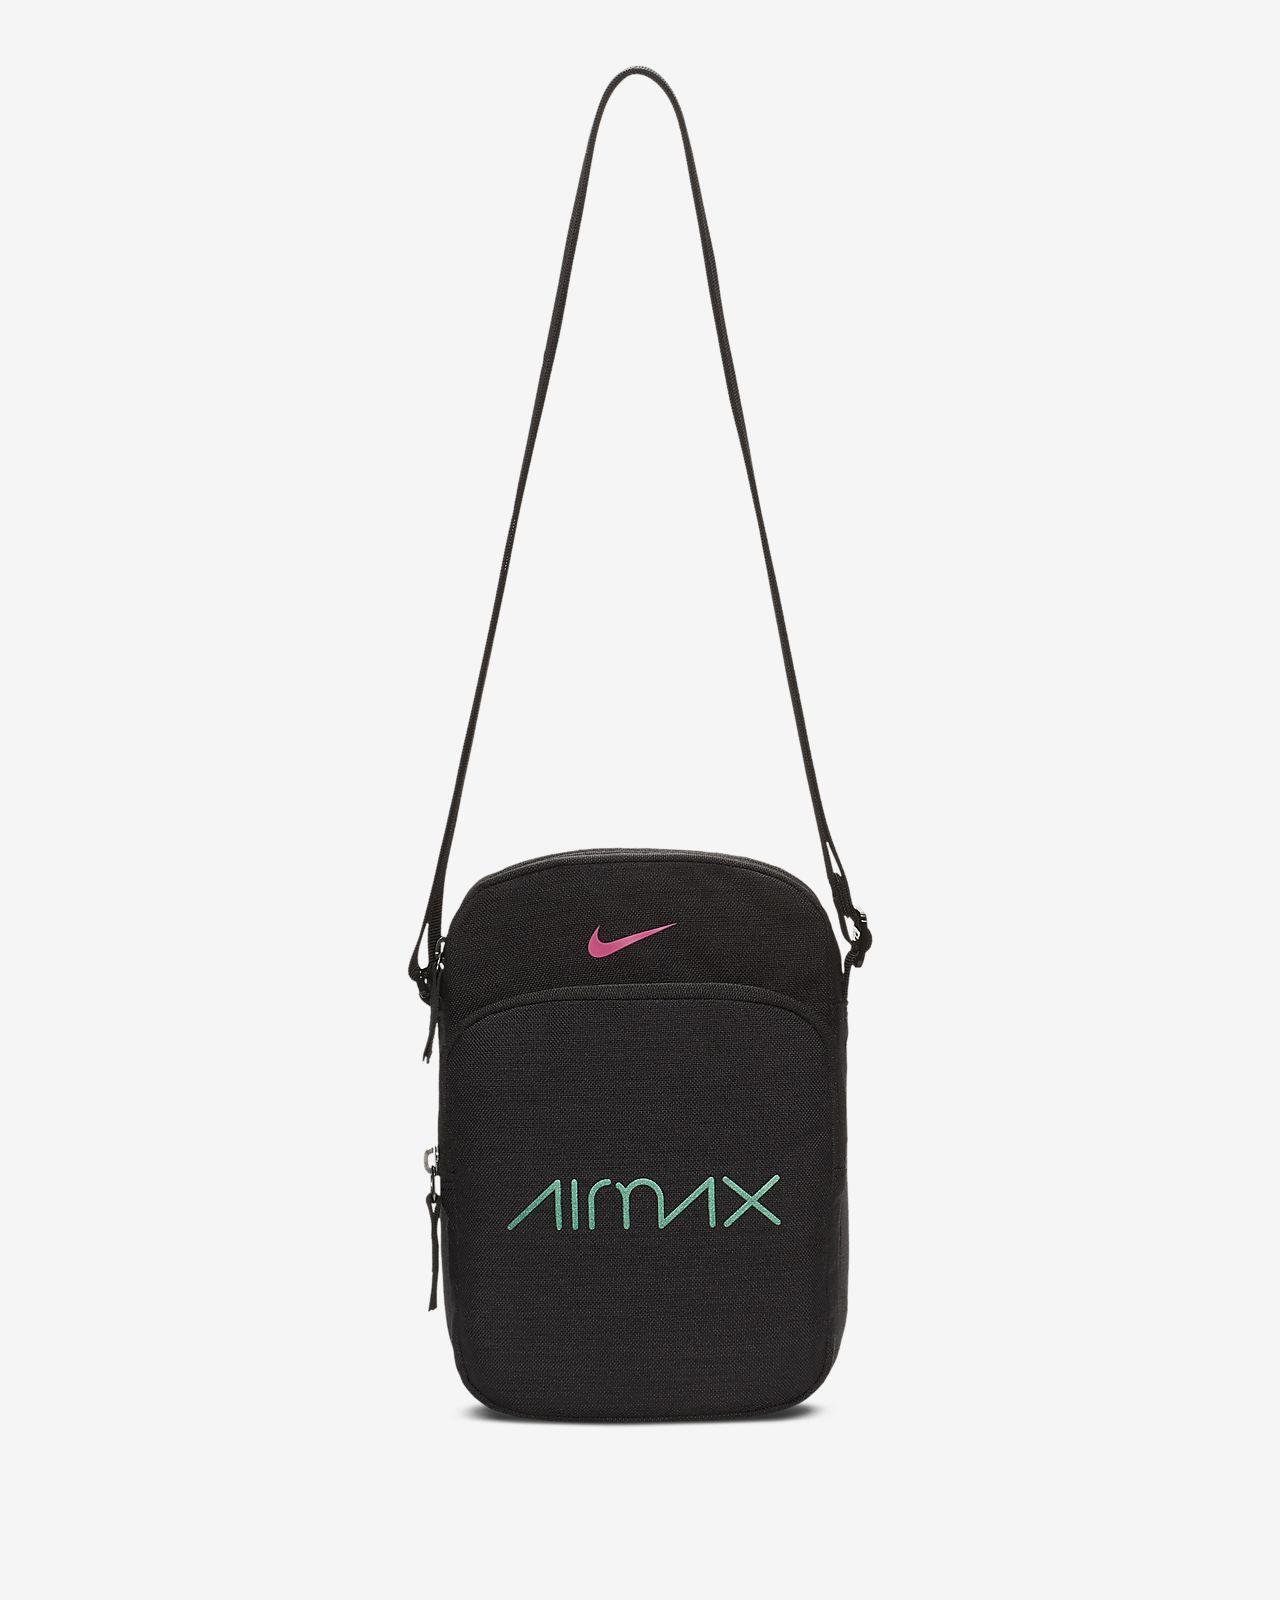 Bolso para objetos pequeños Nike Heritage Air Max Day